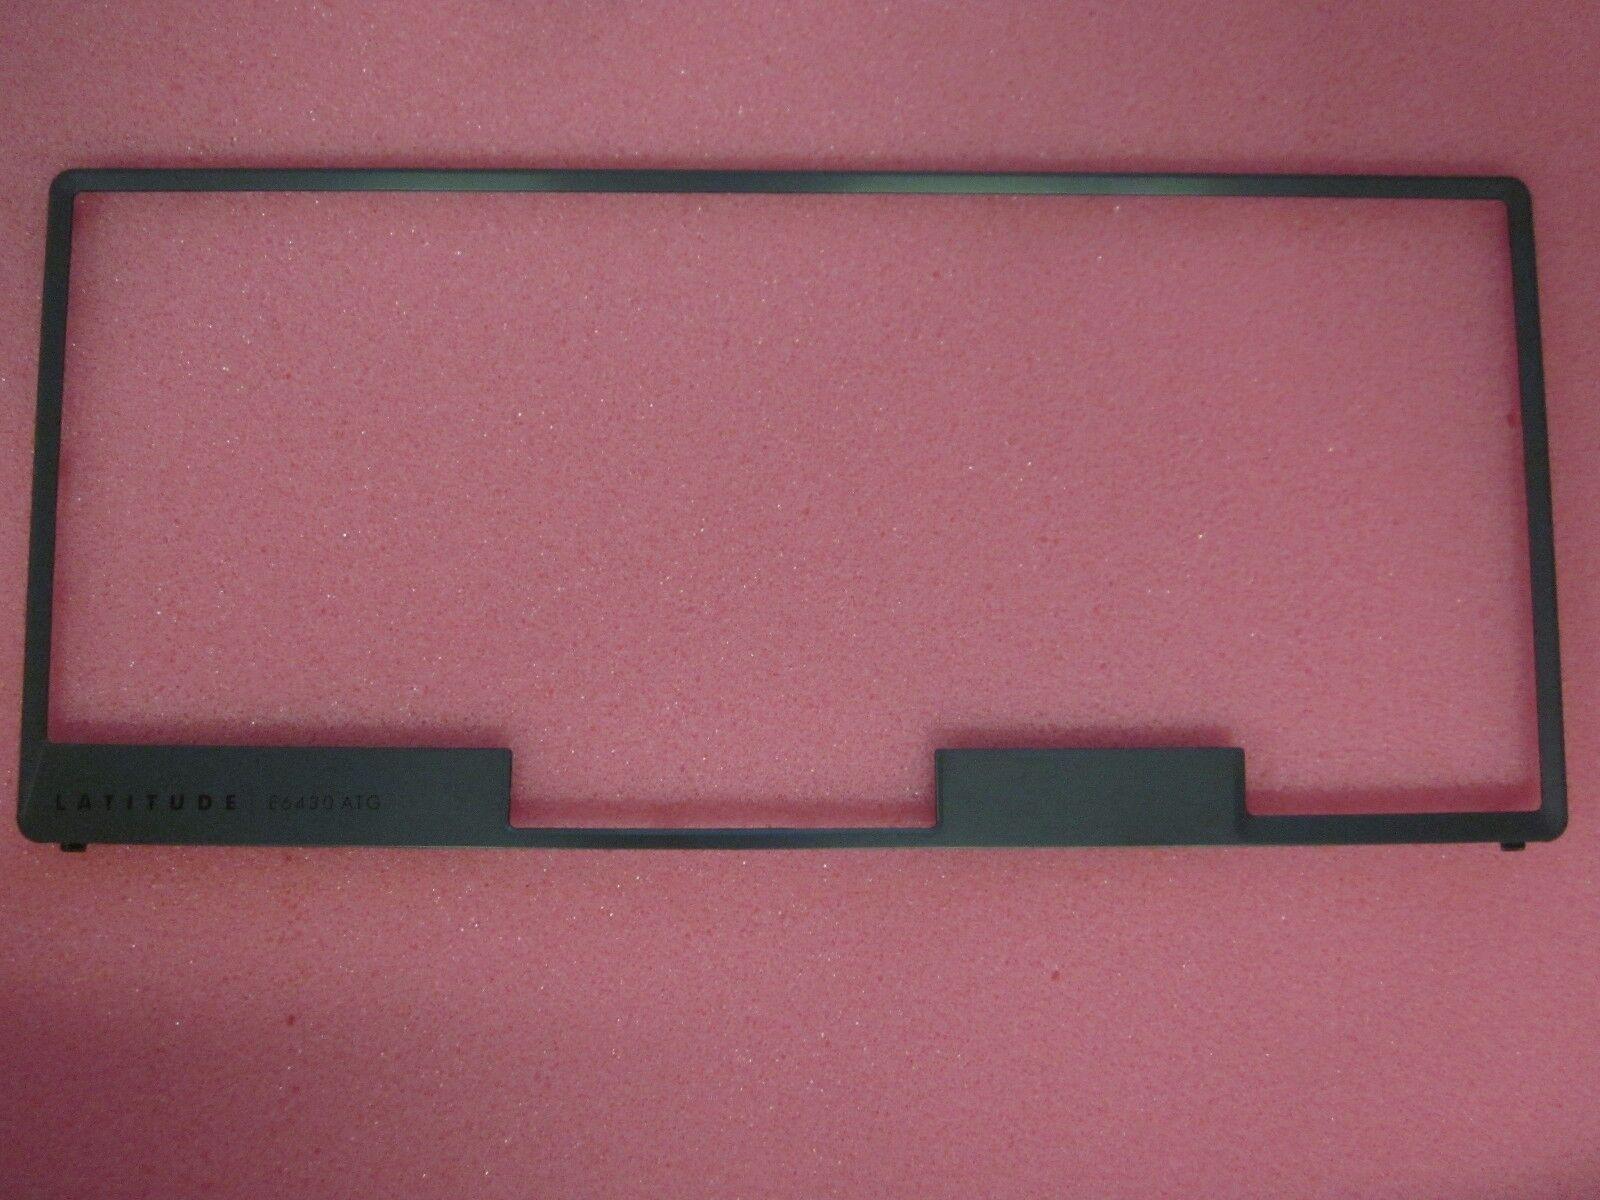 GENUINE Dell Latitude ATG E6430 Keyboard Trim Bezel CWGJ4